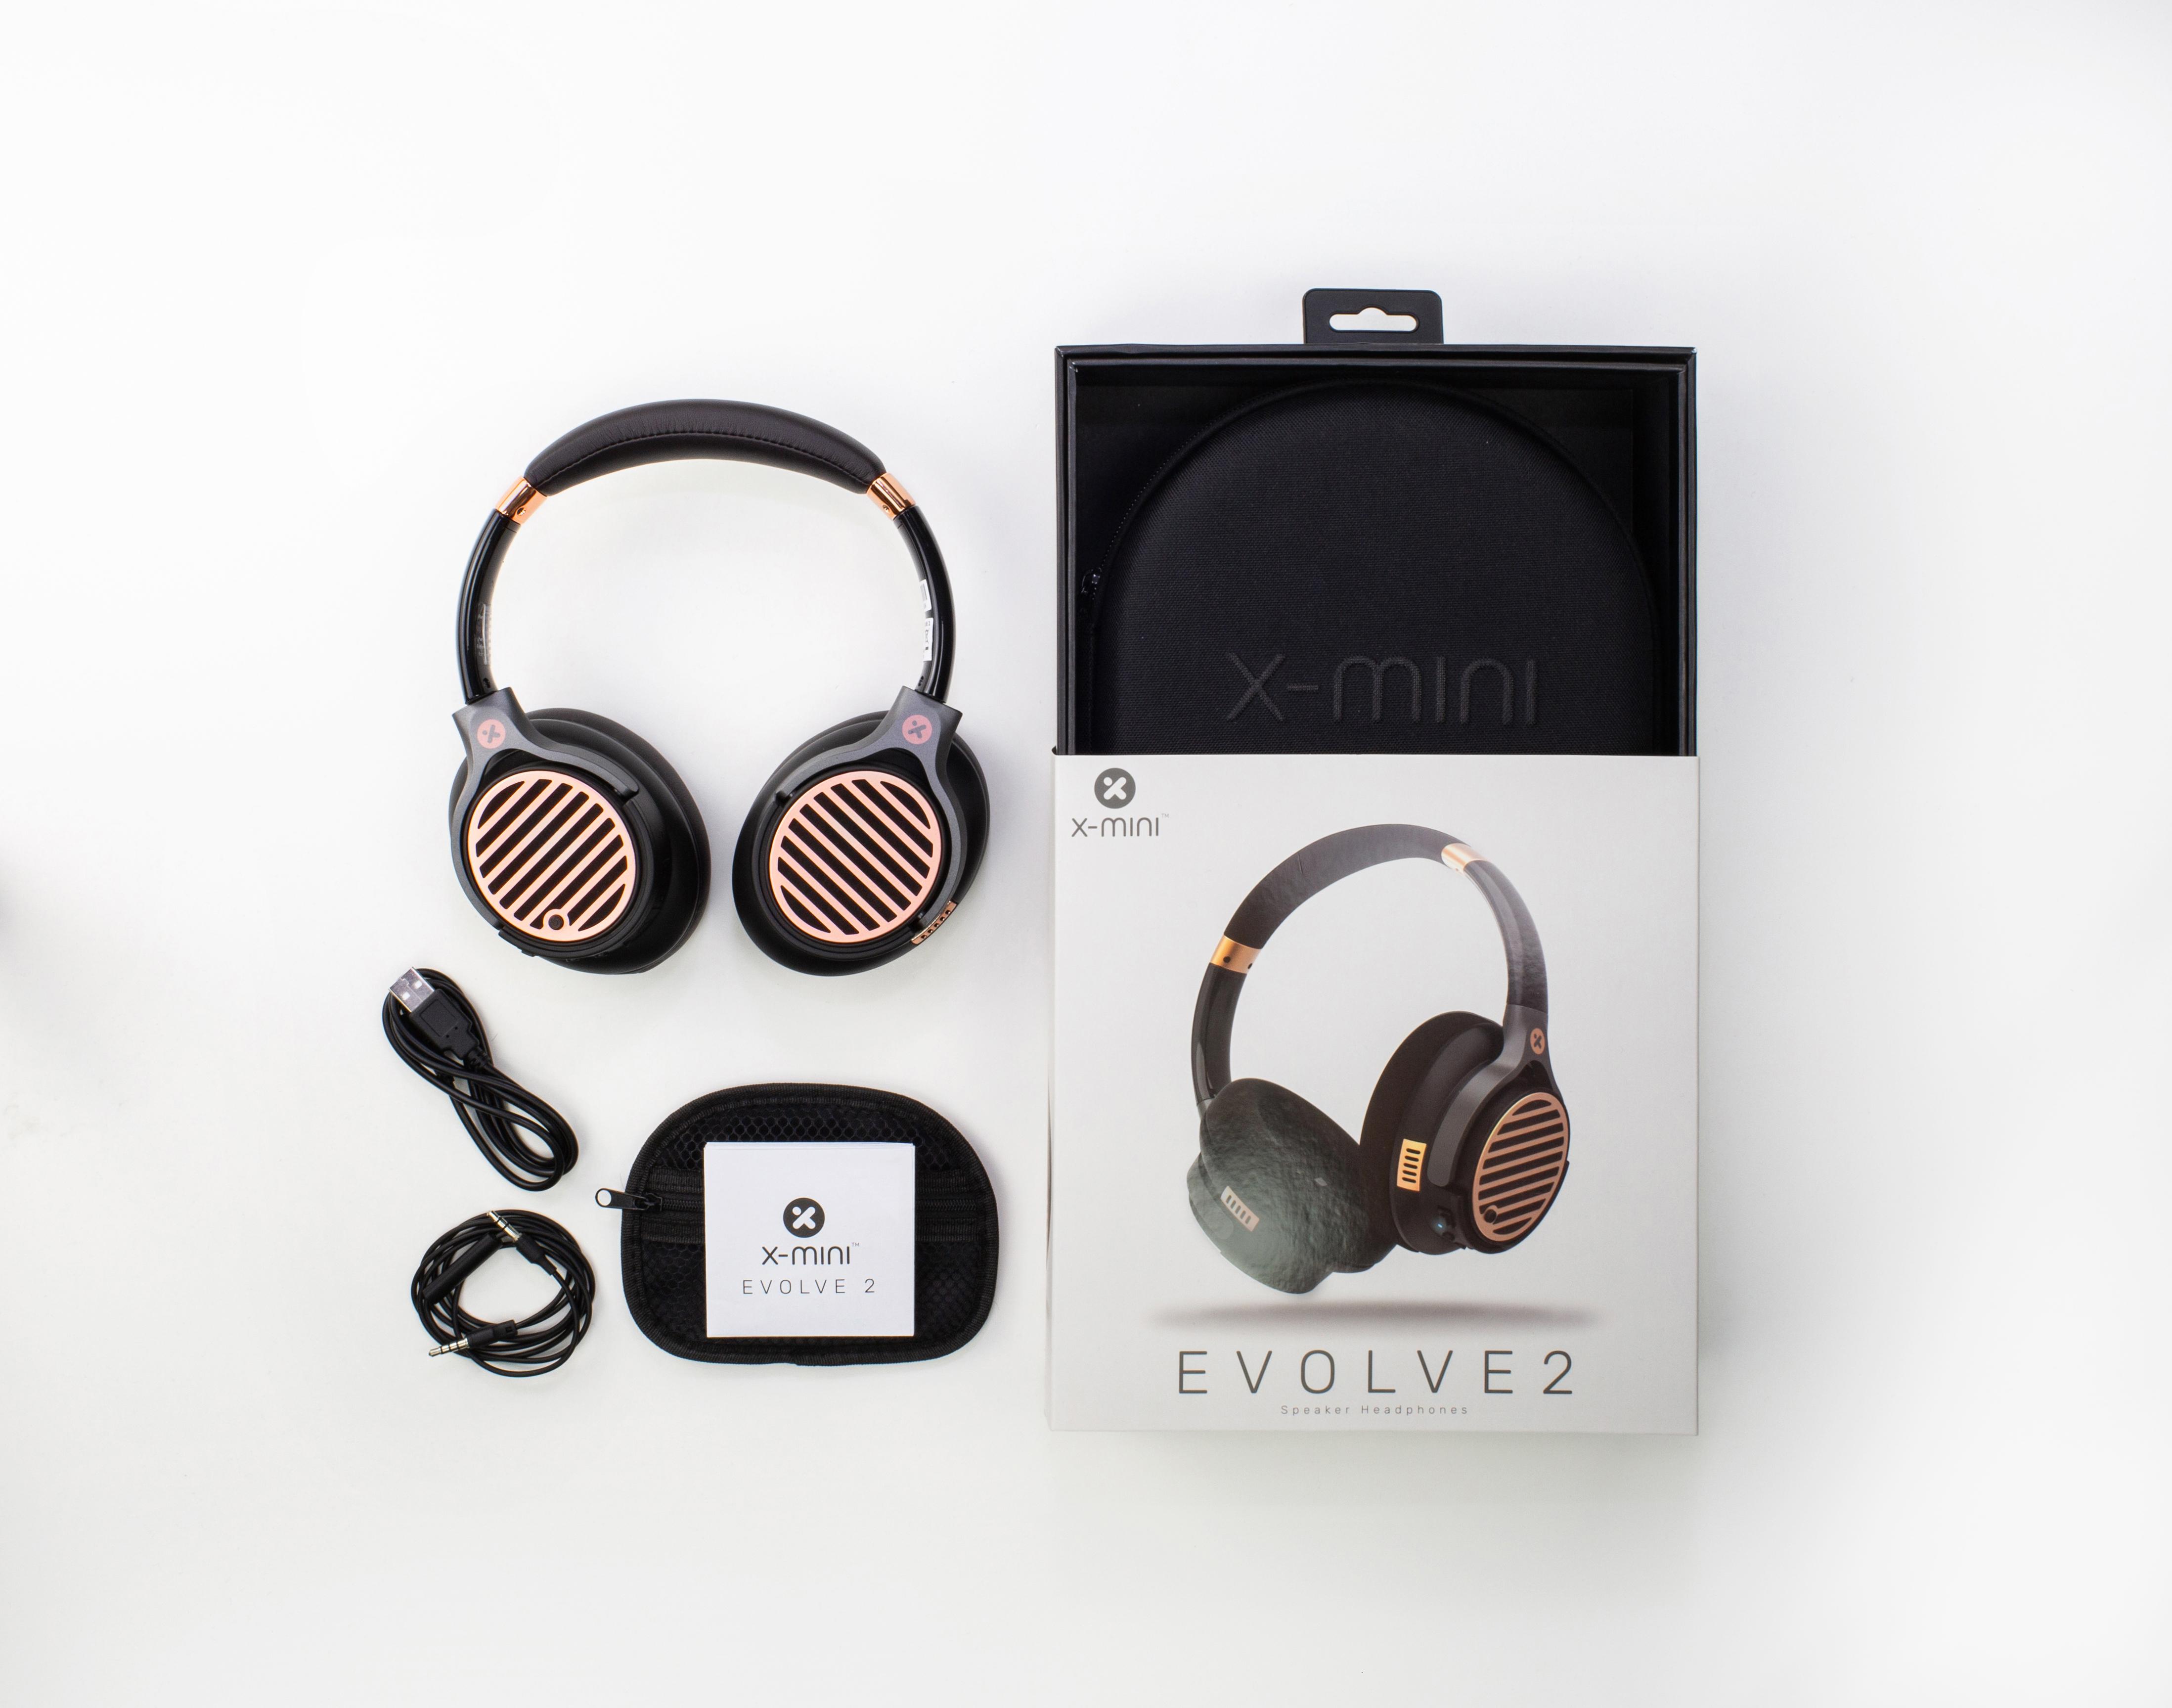 X-mini EVOLVE 2